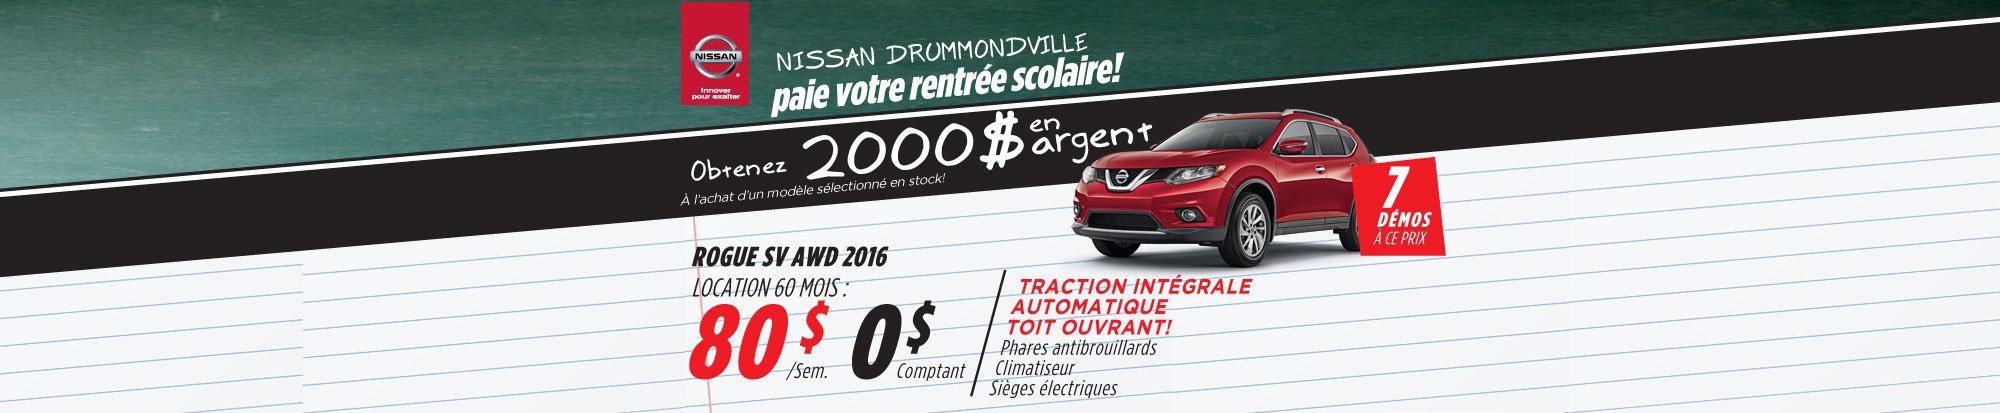 La liquidation top chrono de Nissan - Rogue 2016 drummondville